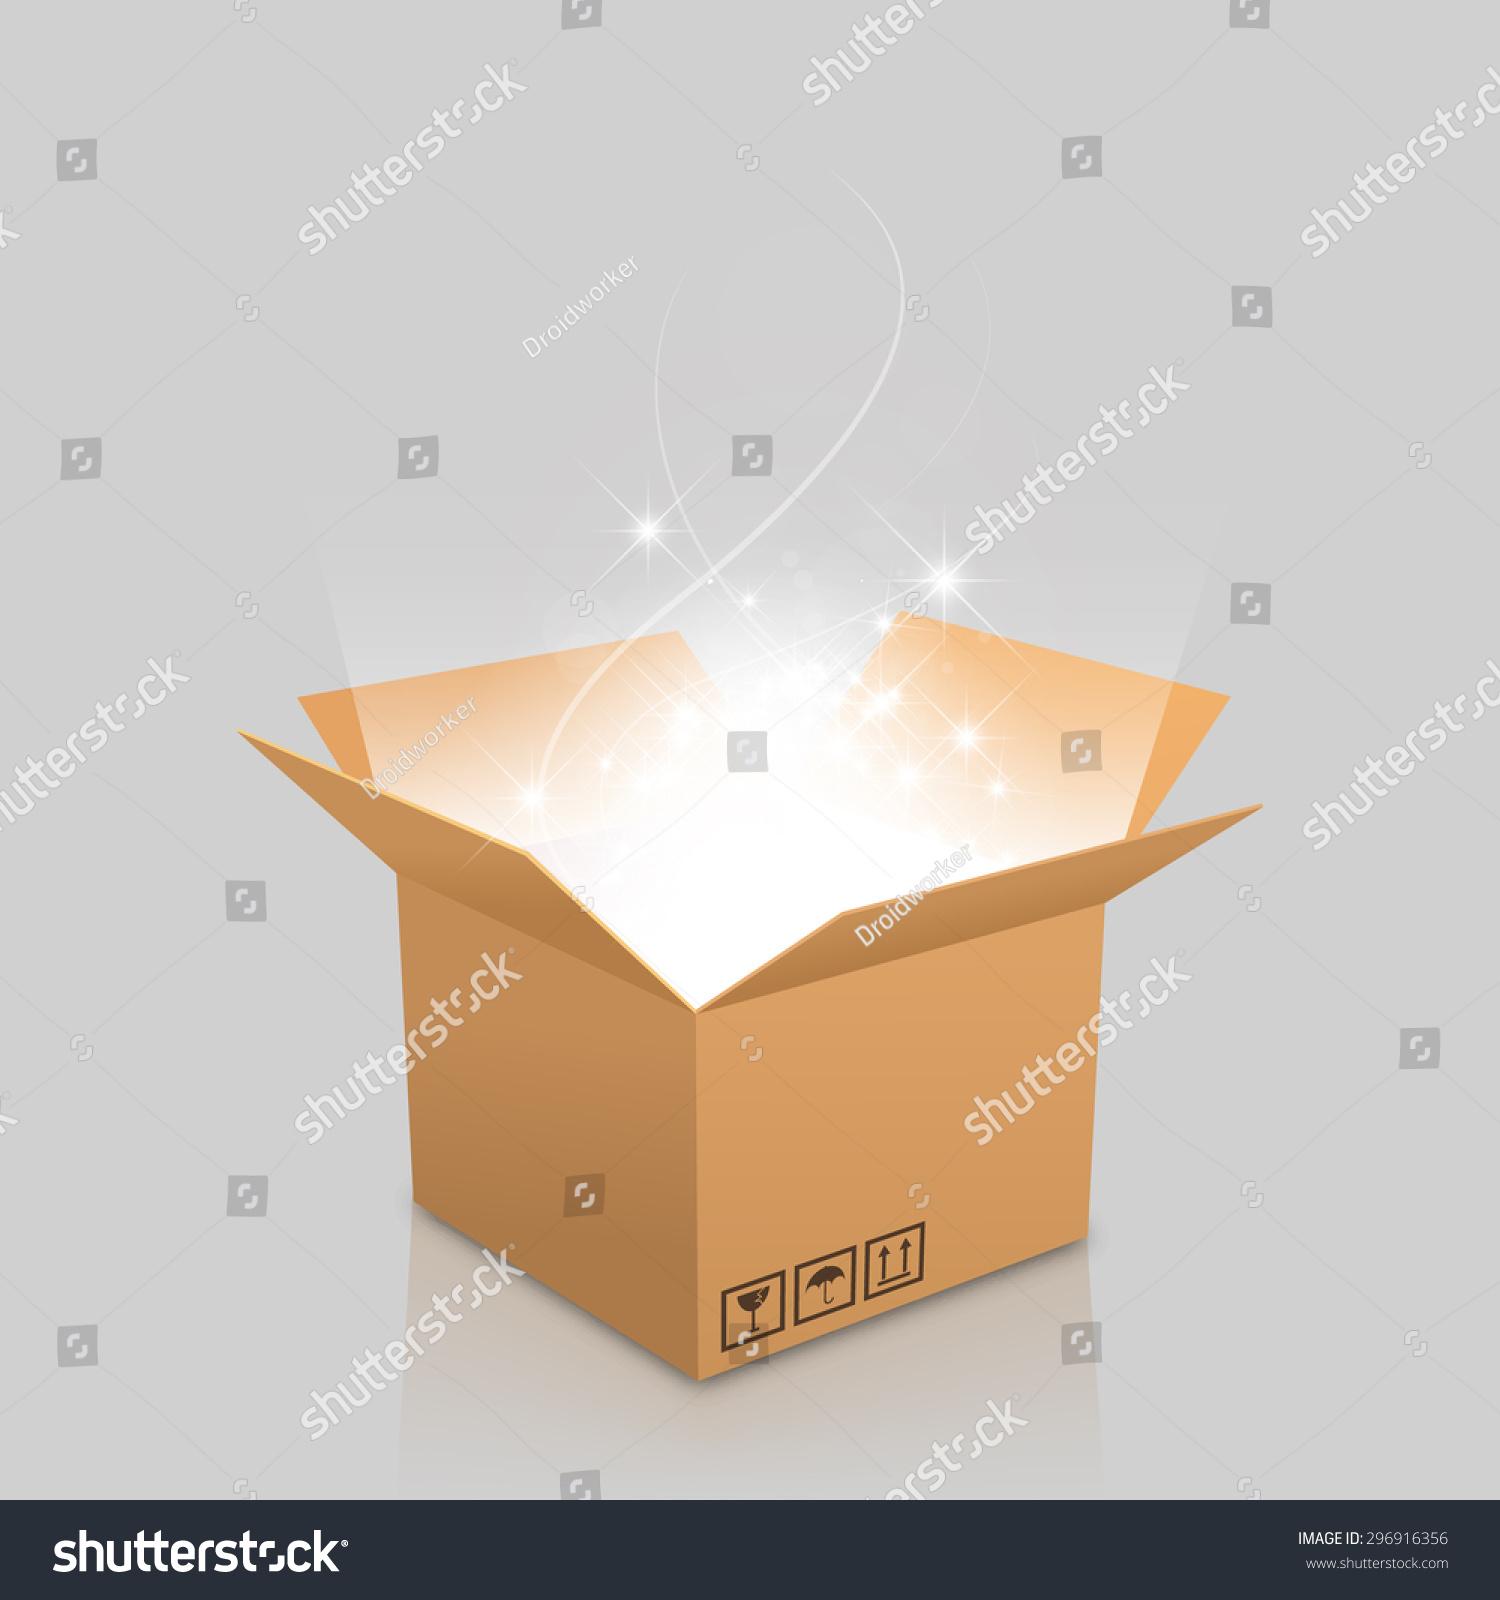 open box outgoing light stock vector 296916356 shutterstock. Black Bedroom Furniture Sets. Home Design Ideas